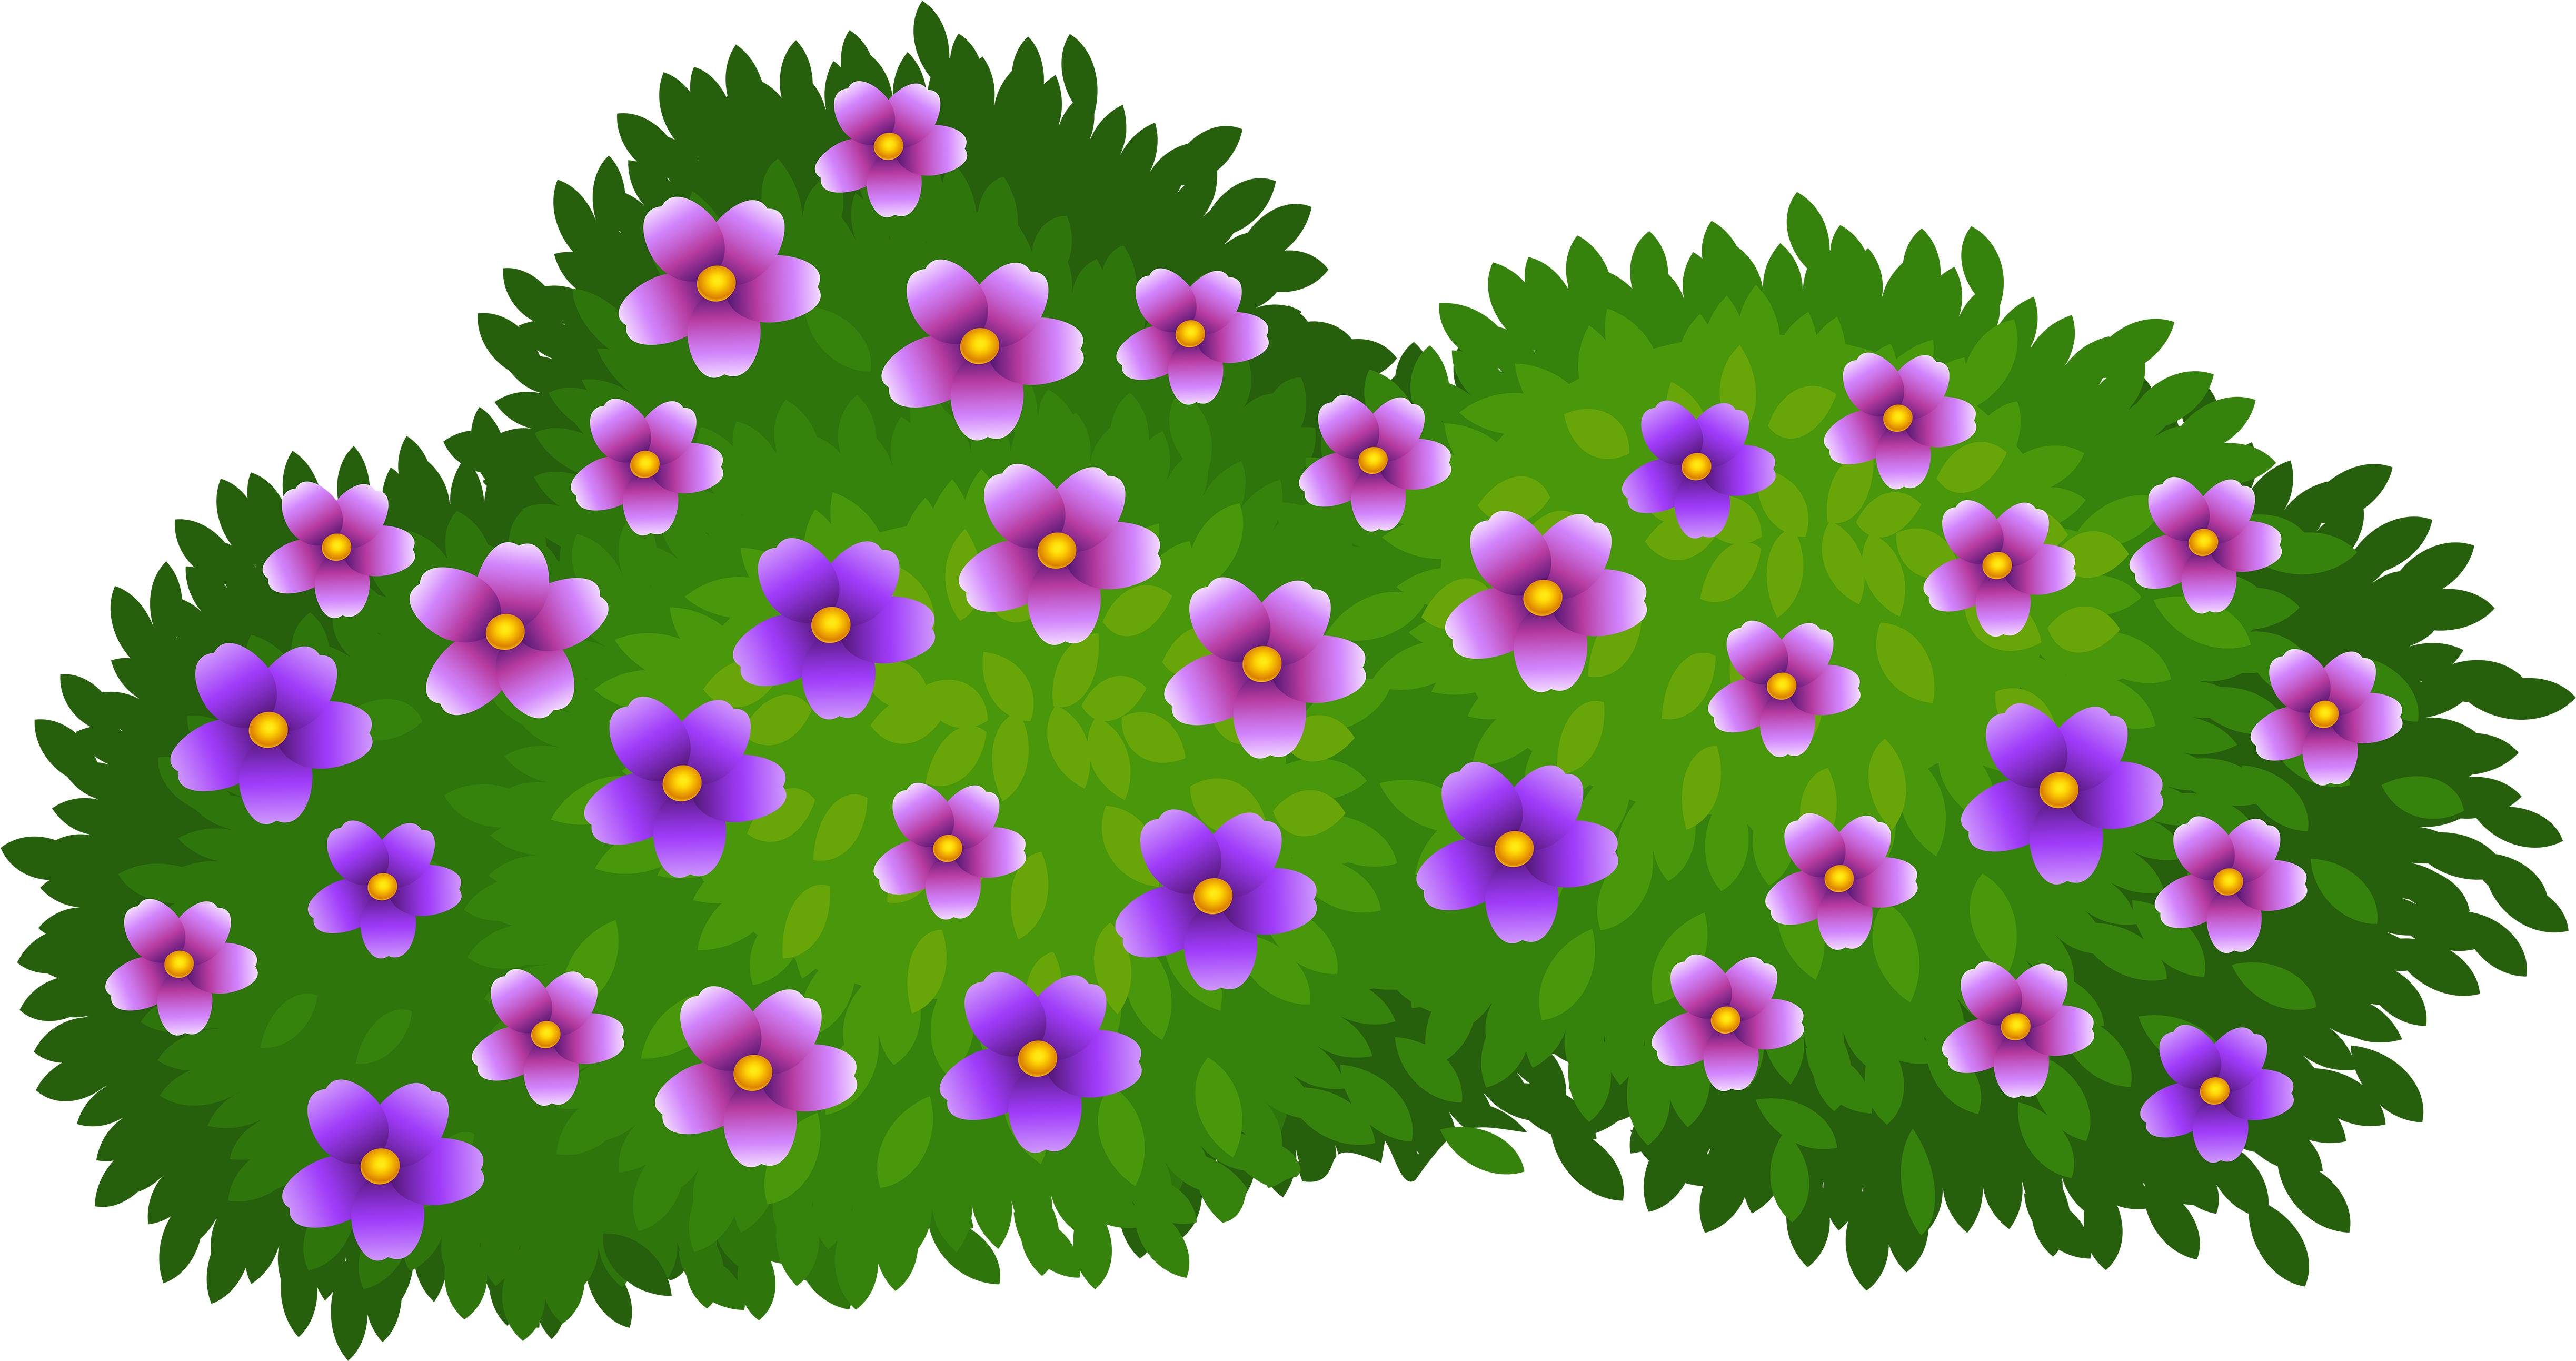 Hd flower bush free. Bushes clipart